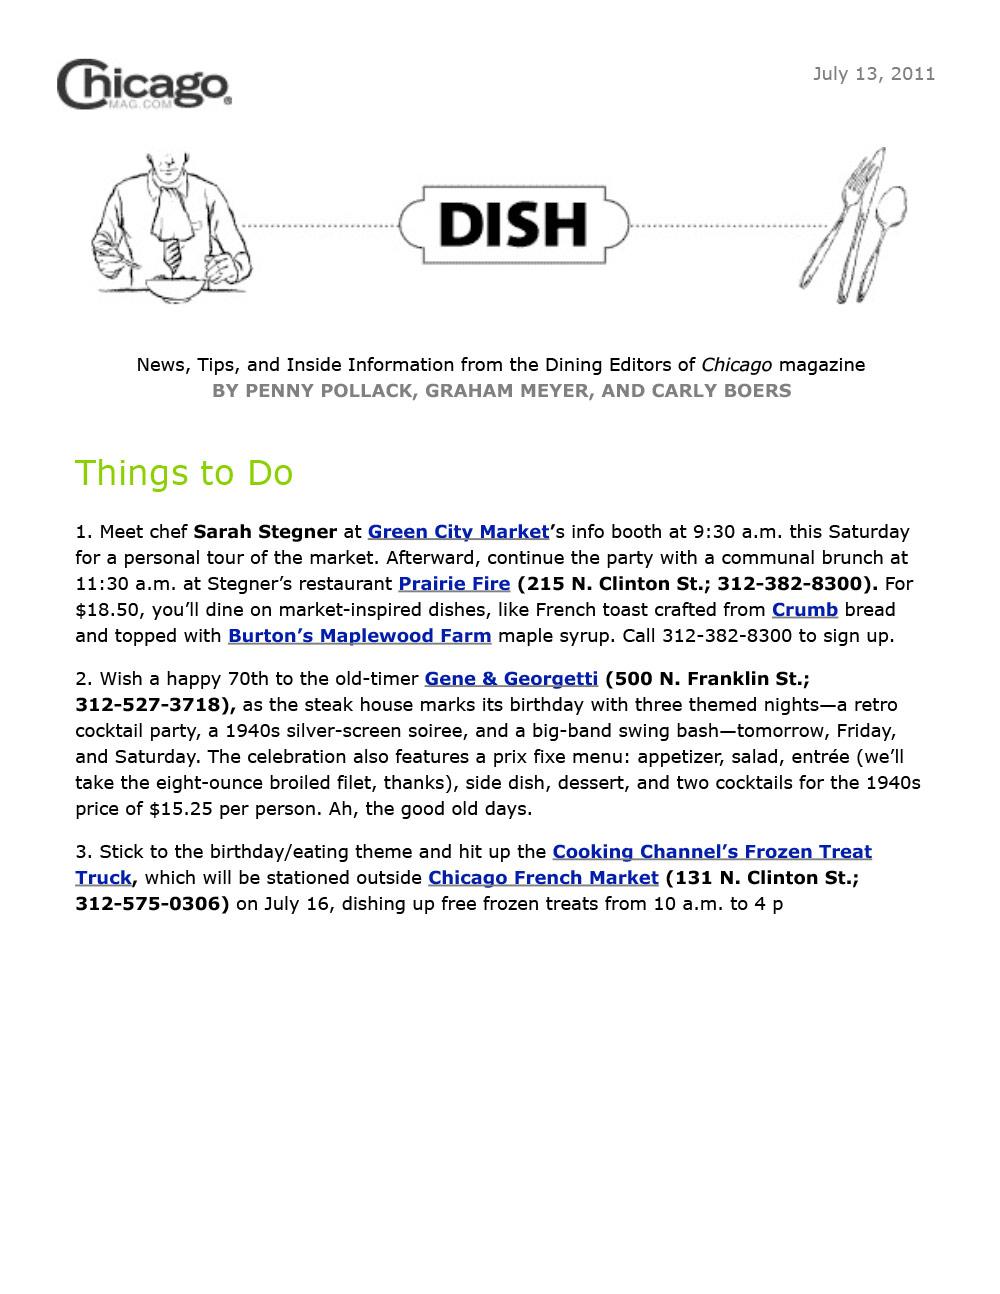 TheDish7.13